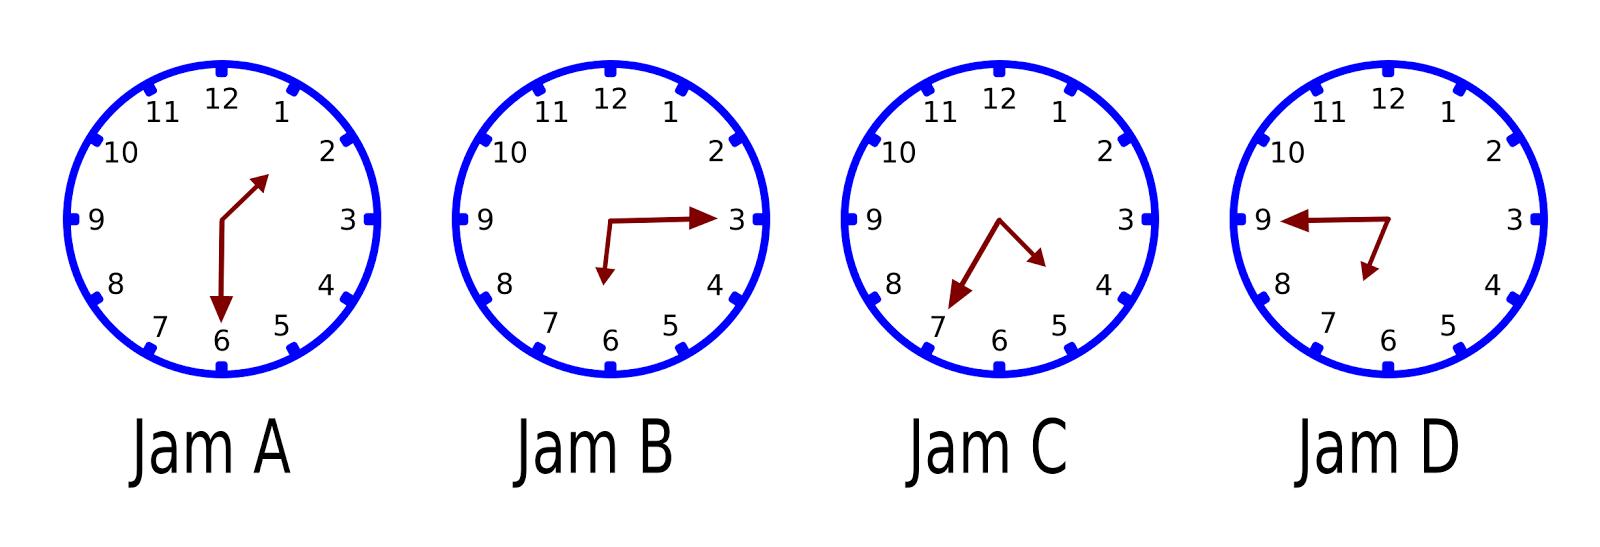 Soal Matematika Kelas 3 Sd Bab 5 Pengukuran Panjang Waktu Dan Berat Dan Kunci Jawaban Bimbel